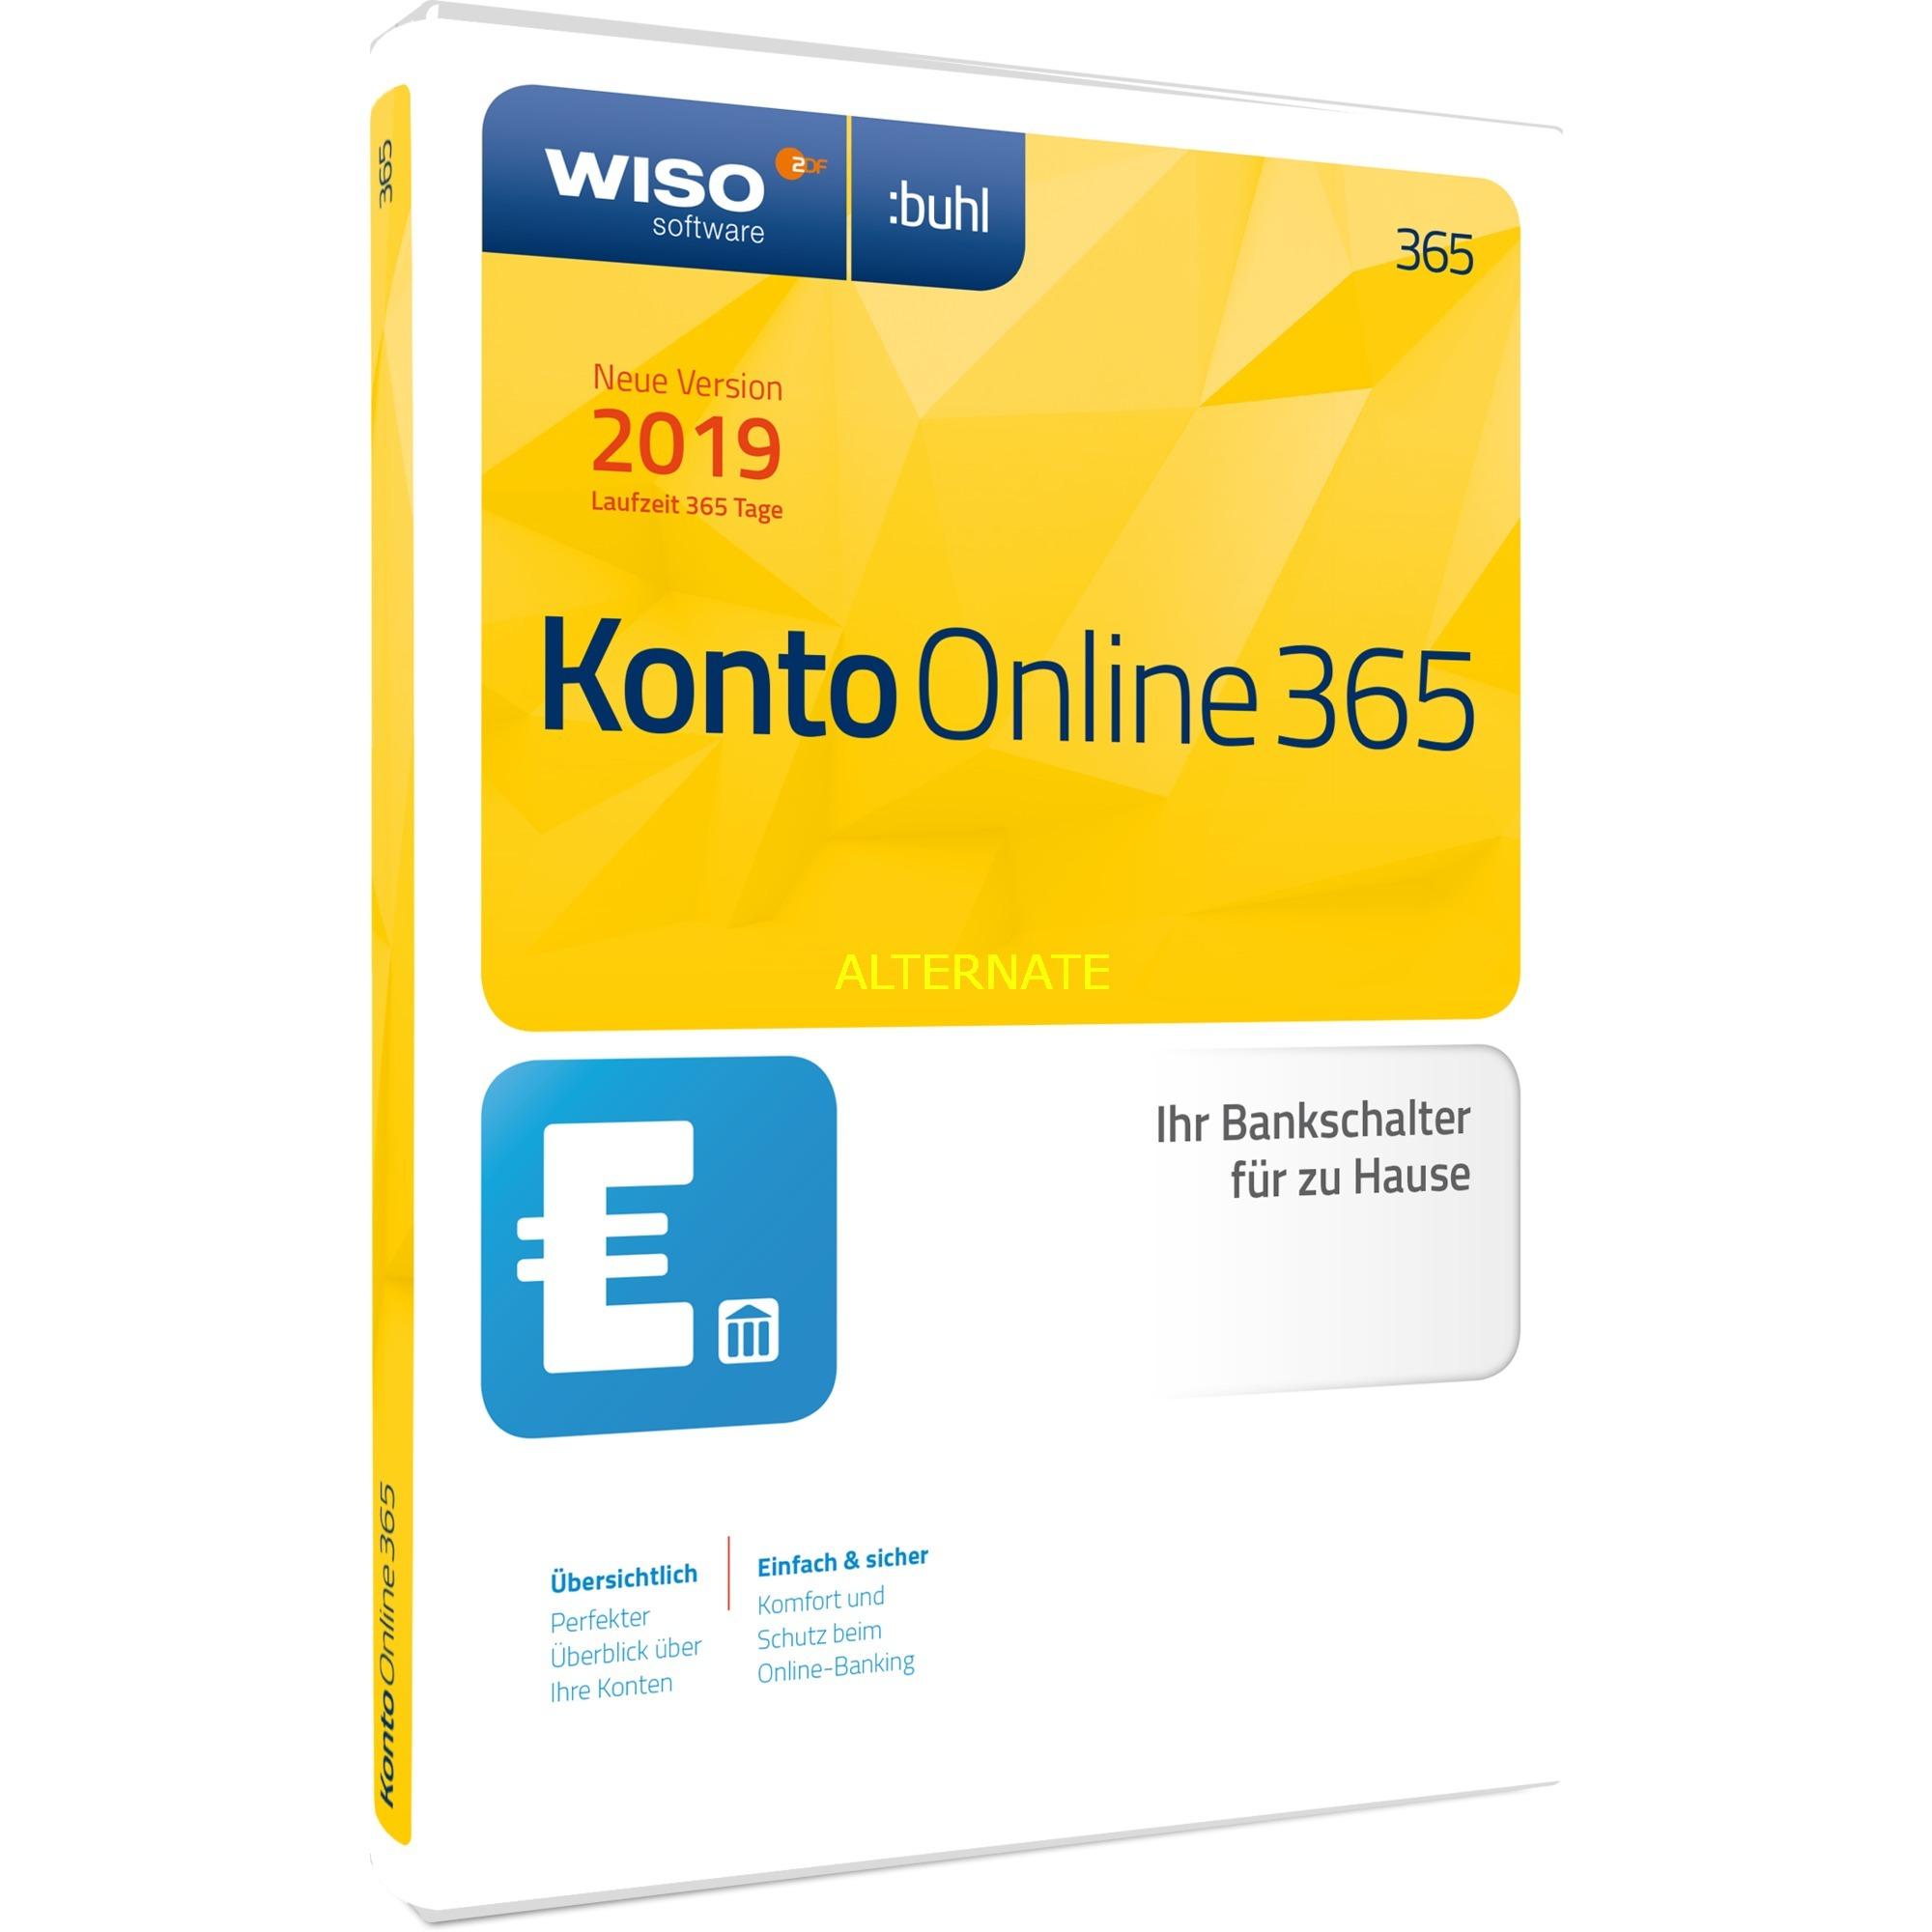 KW42641-19, Software